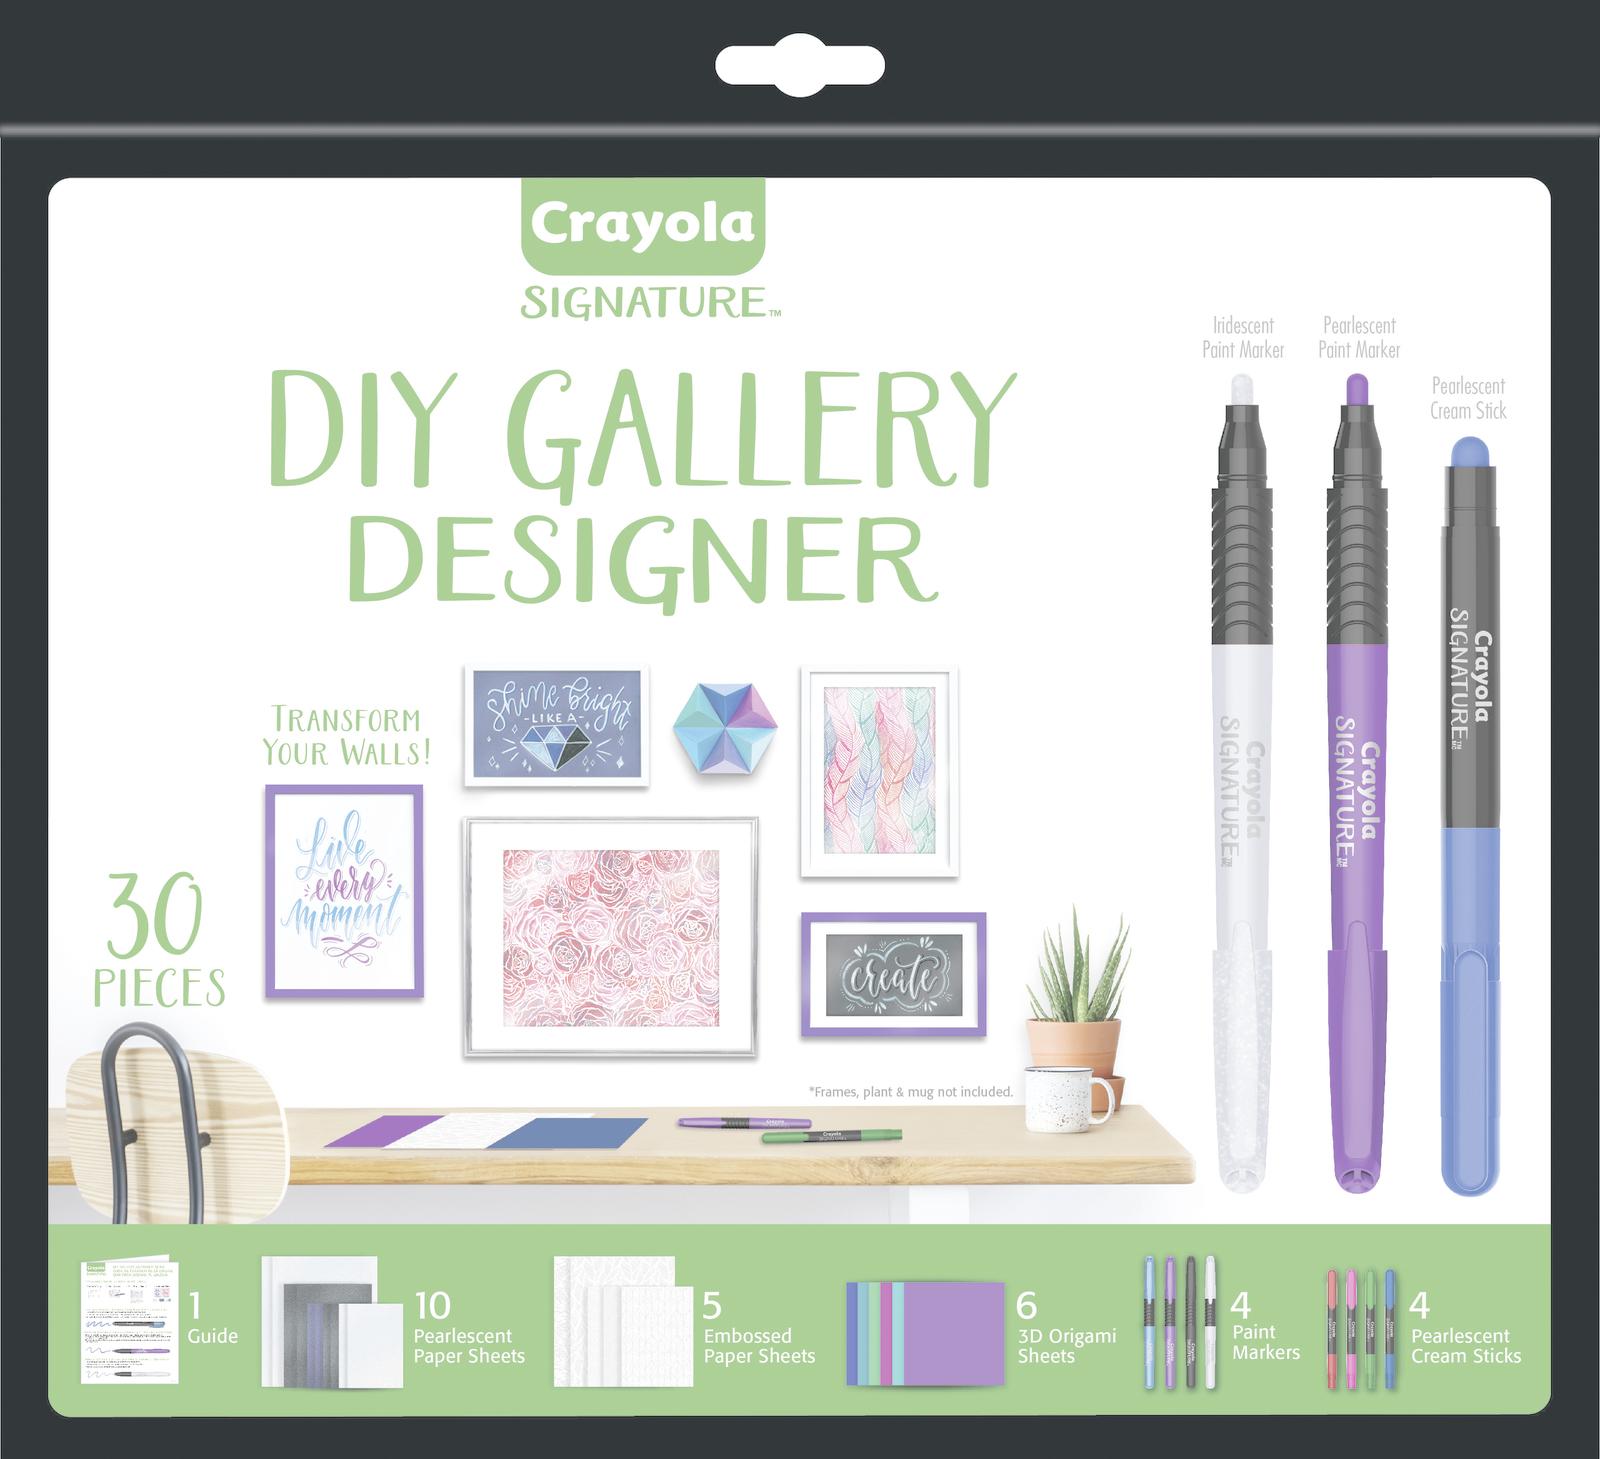 Crayola: Signature - DIY Gallery Designer image